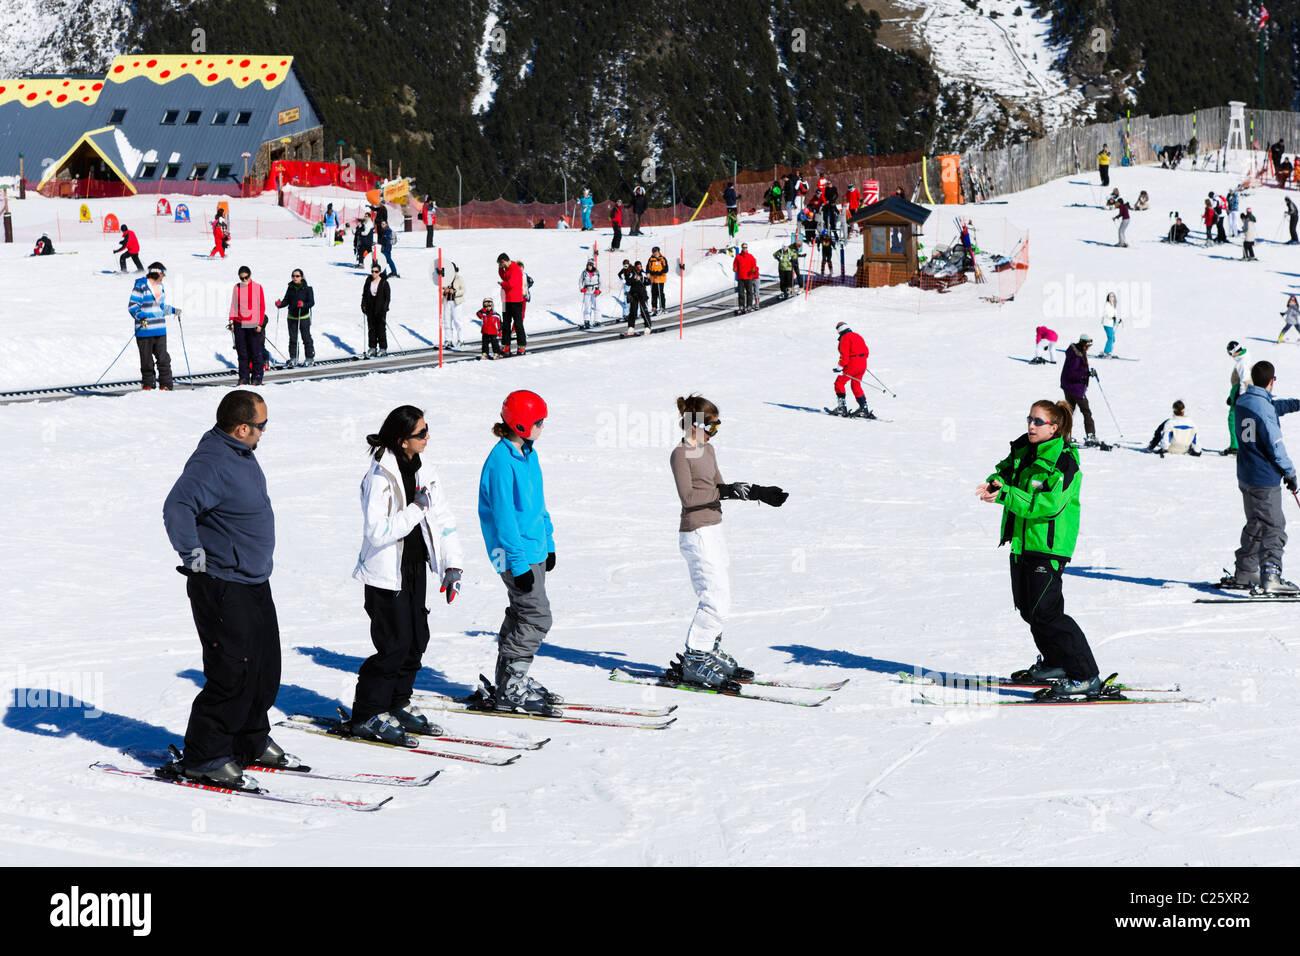 Ski school on the nursery slopes at Comallempla, Arinsal, Vallnord Ski Area, Andorra - Stock Image